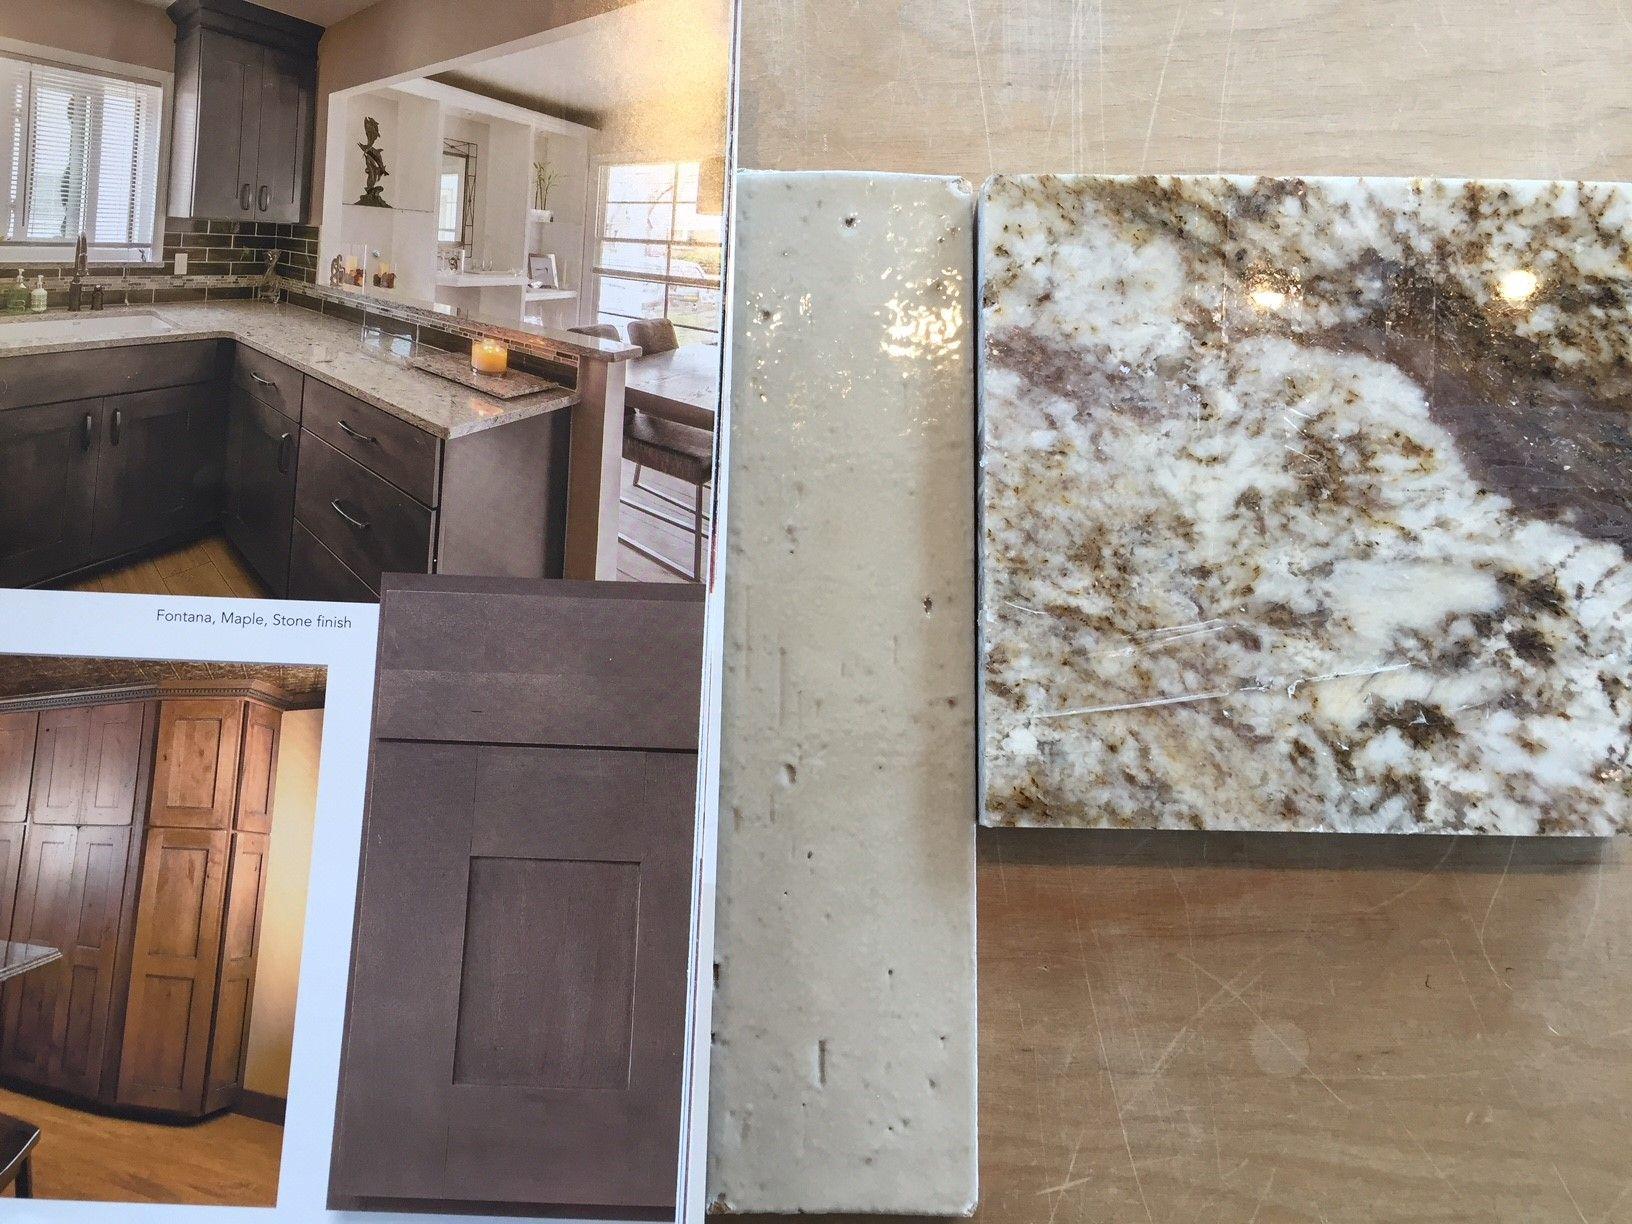 Kitchen Backsplash Long Format Cream Colored Subway Tile With